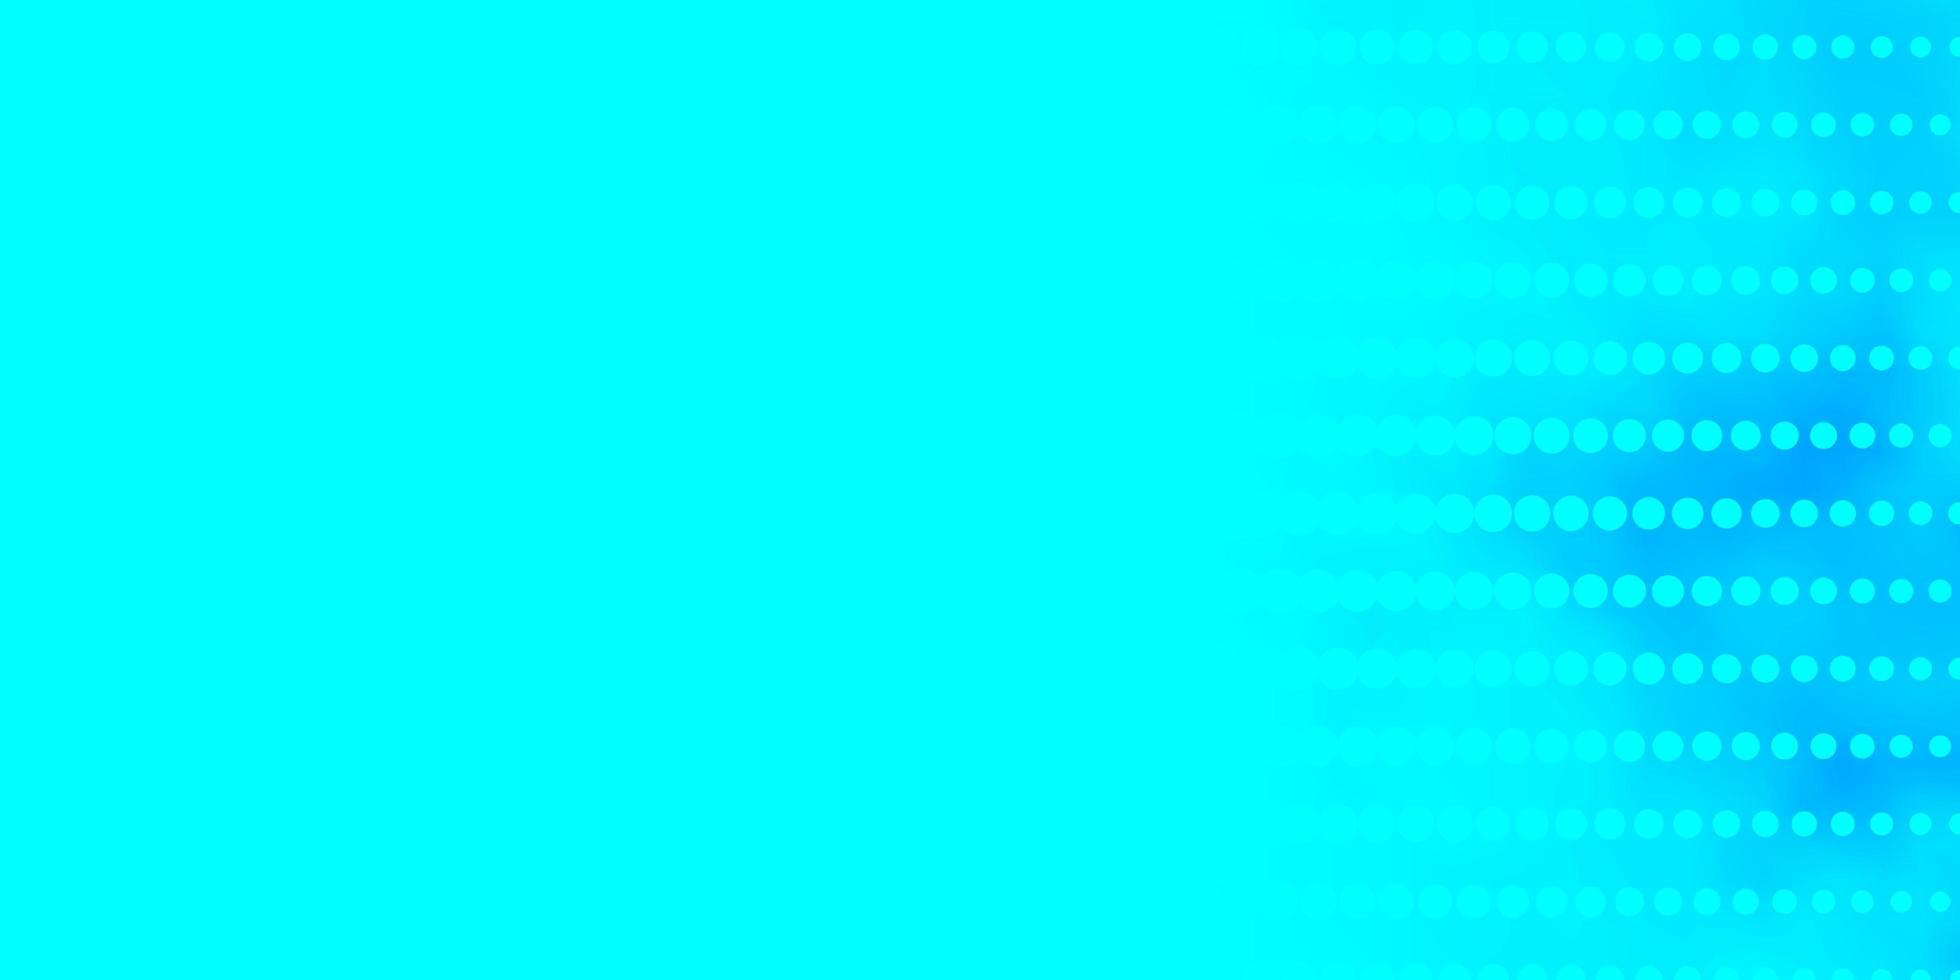 Telón de fondo de vector azul claro con círculos.